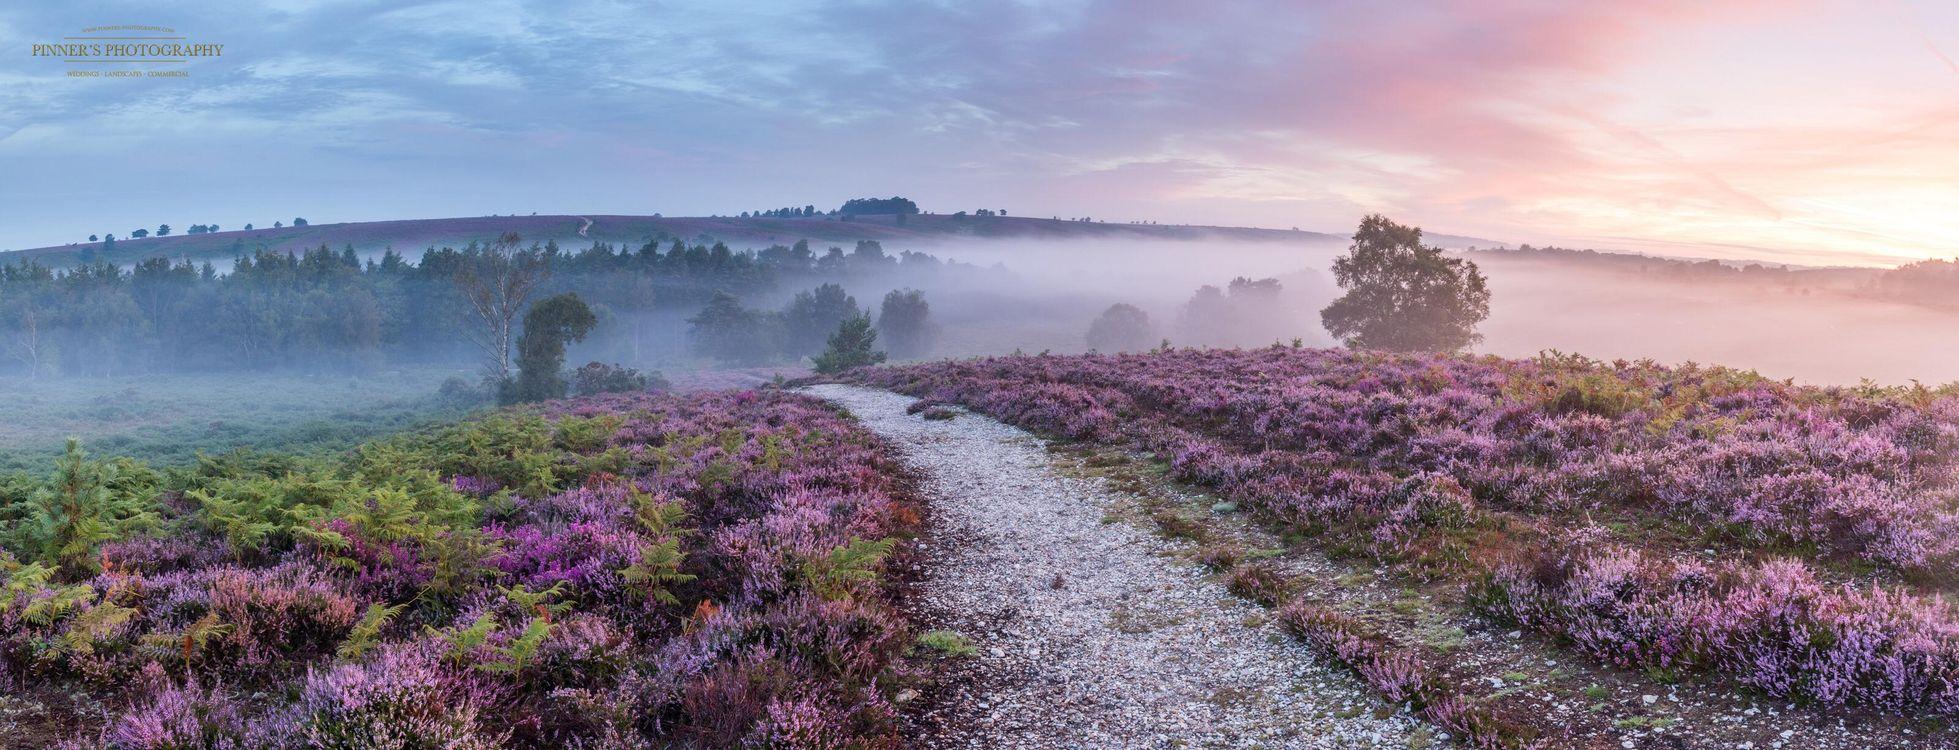 Фото бесплатно поле, панорама, туман - на рабочий стол